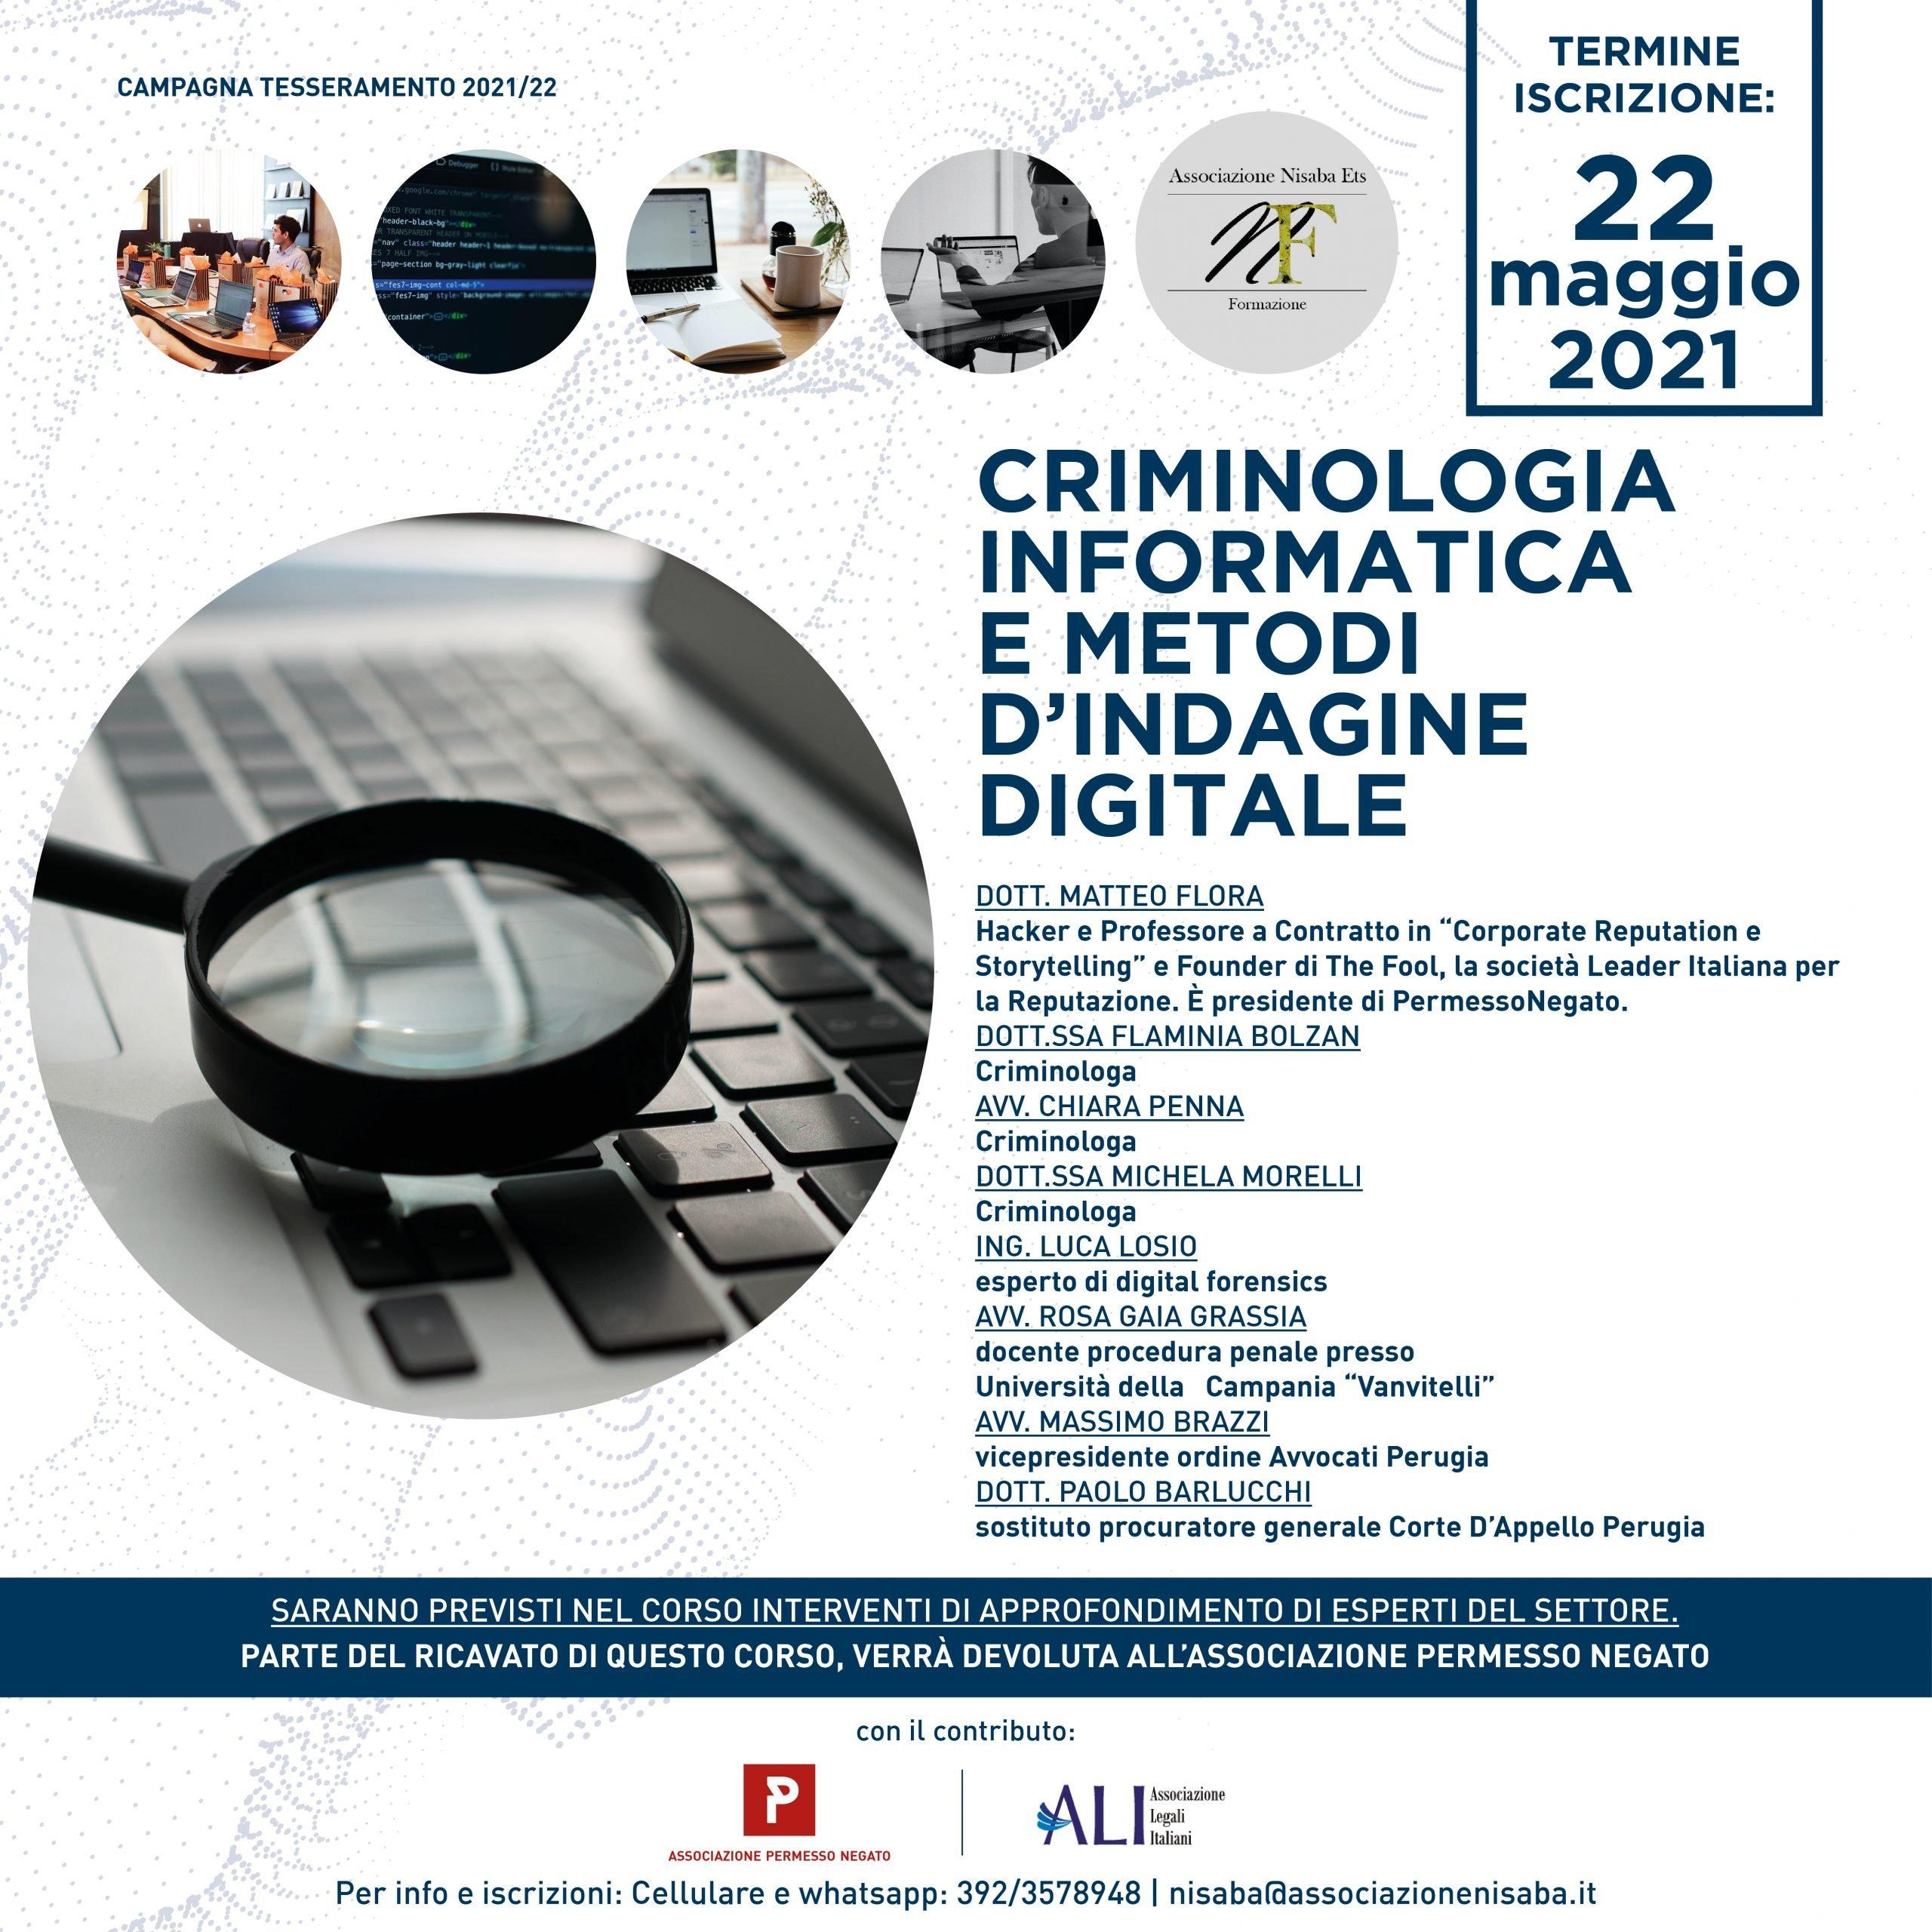 criminologia informatica e metodi d'indagine digitale